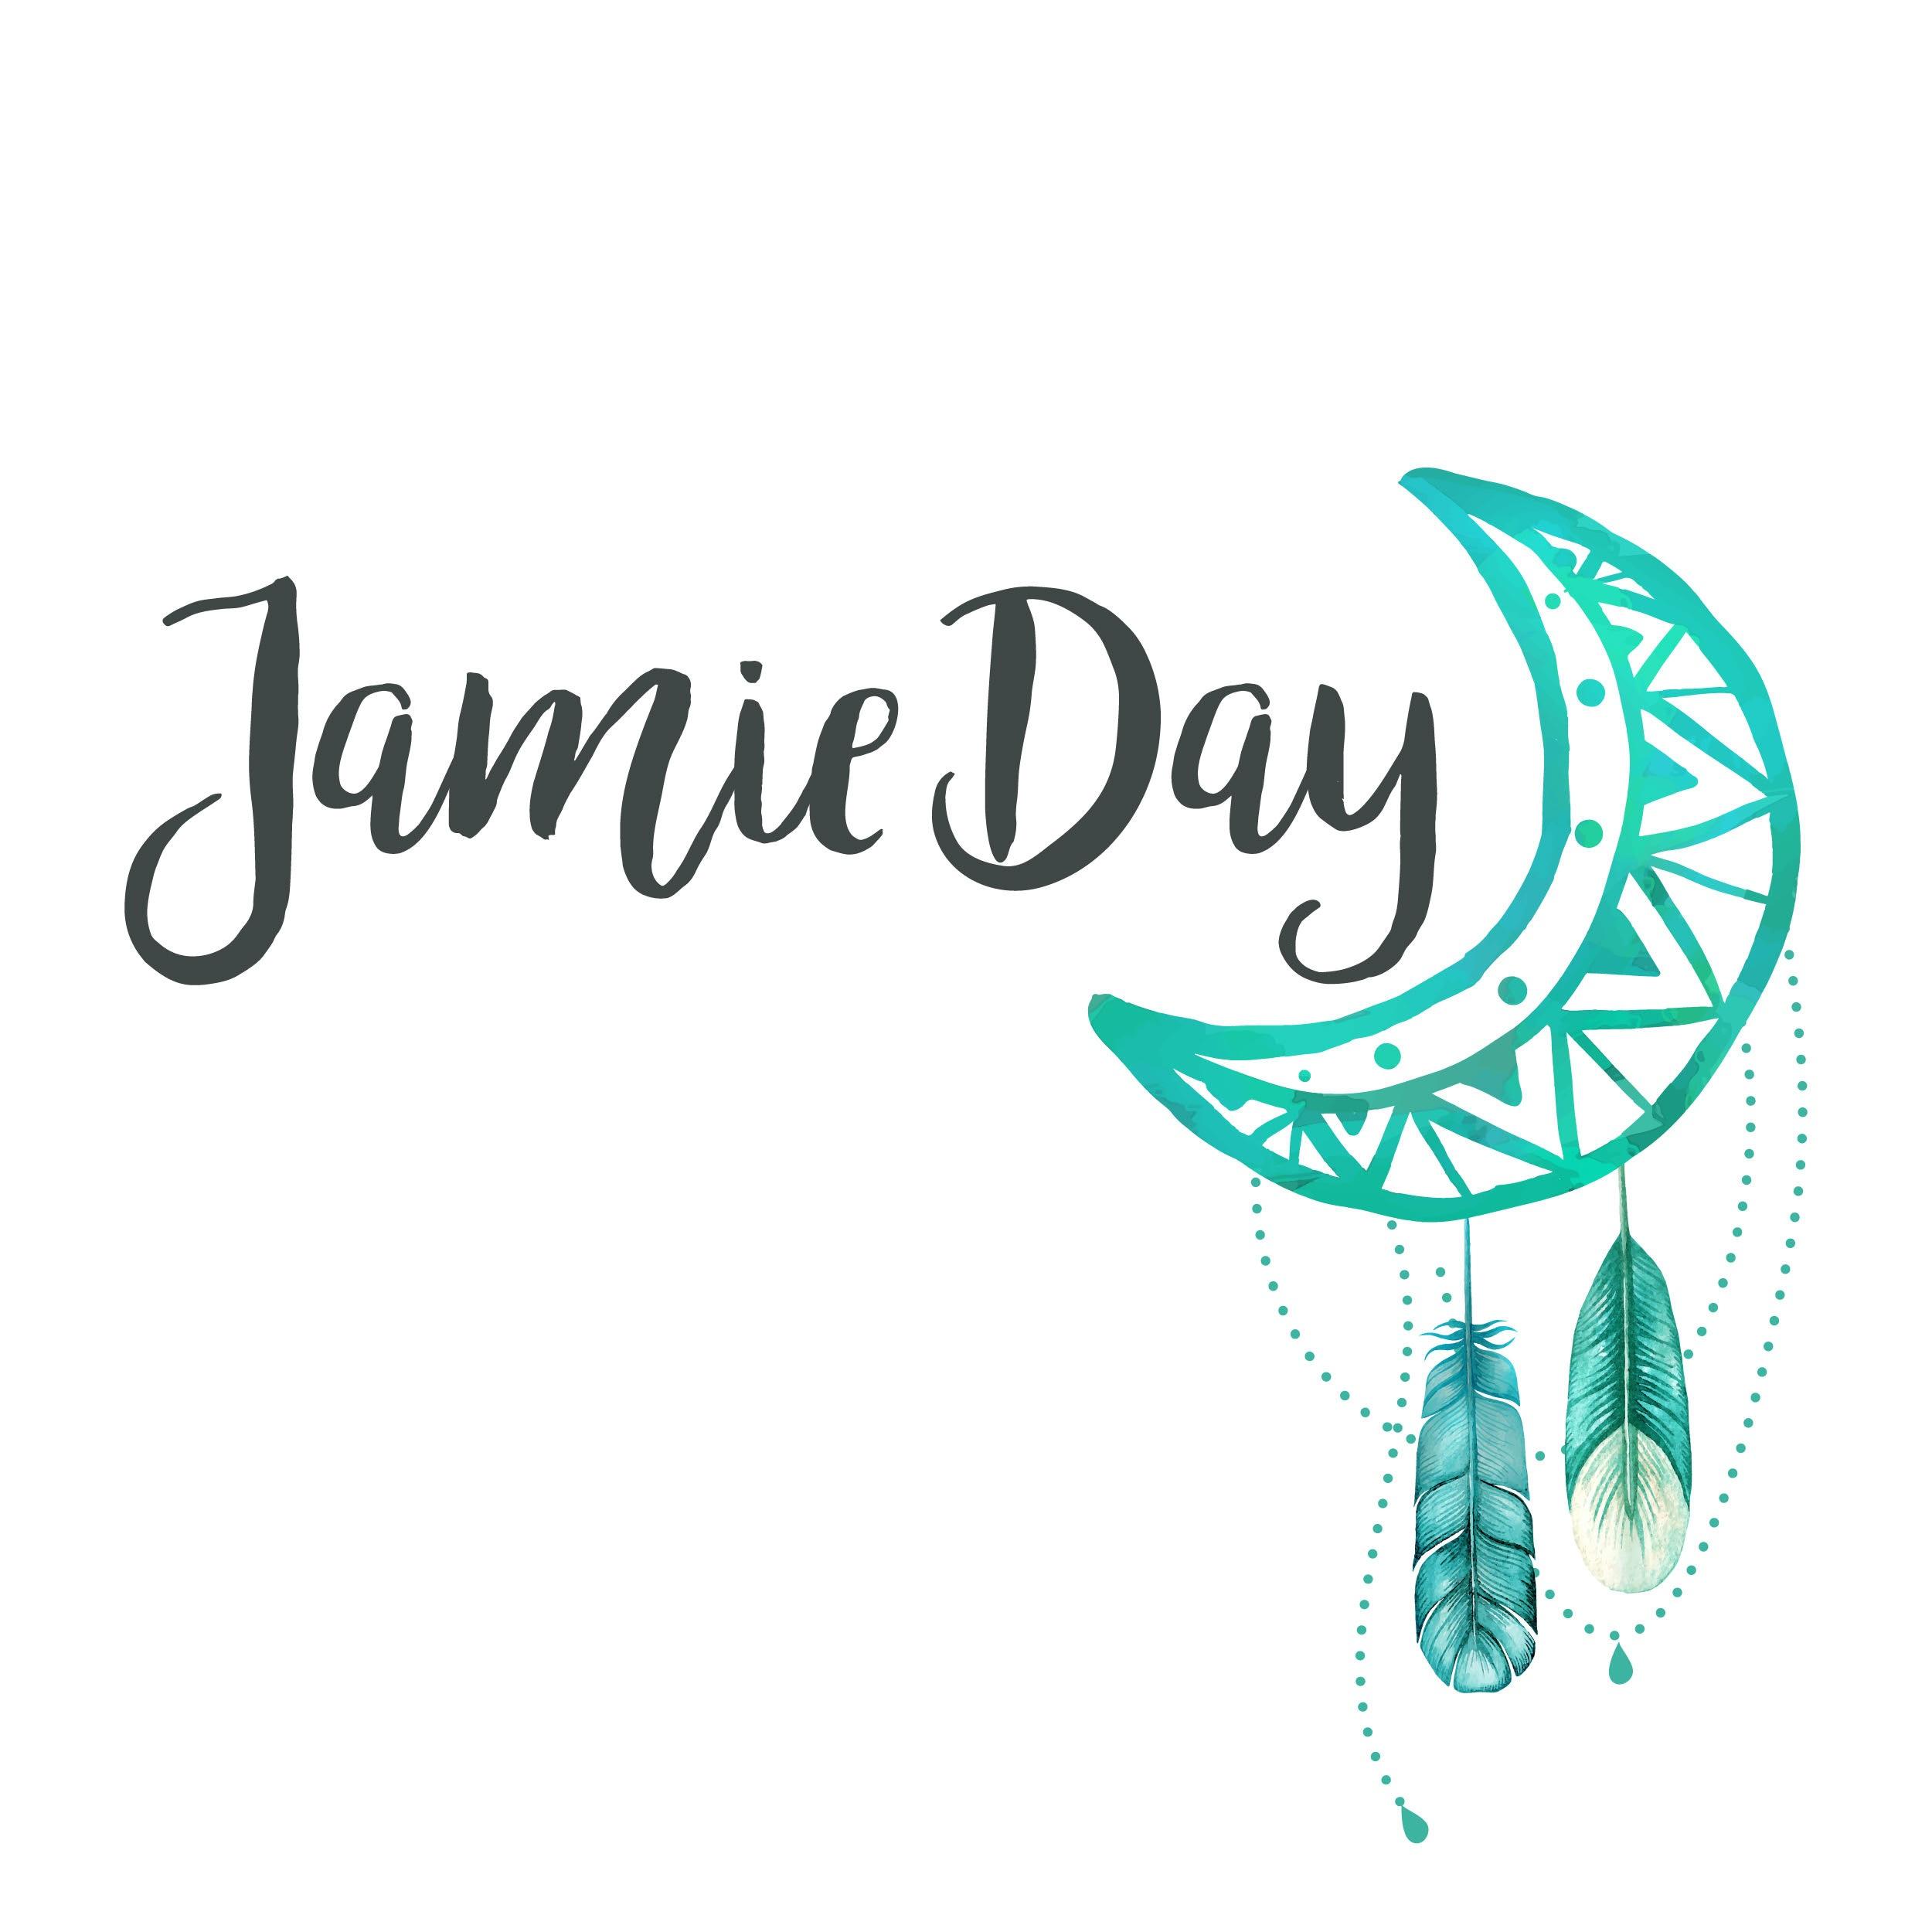 Jamie Day